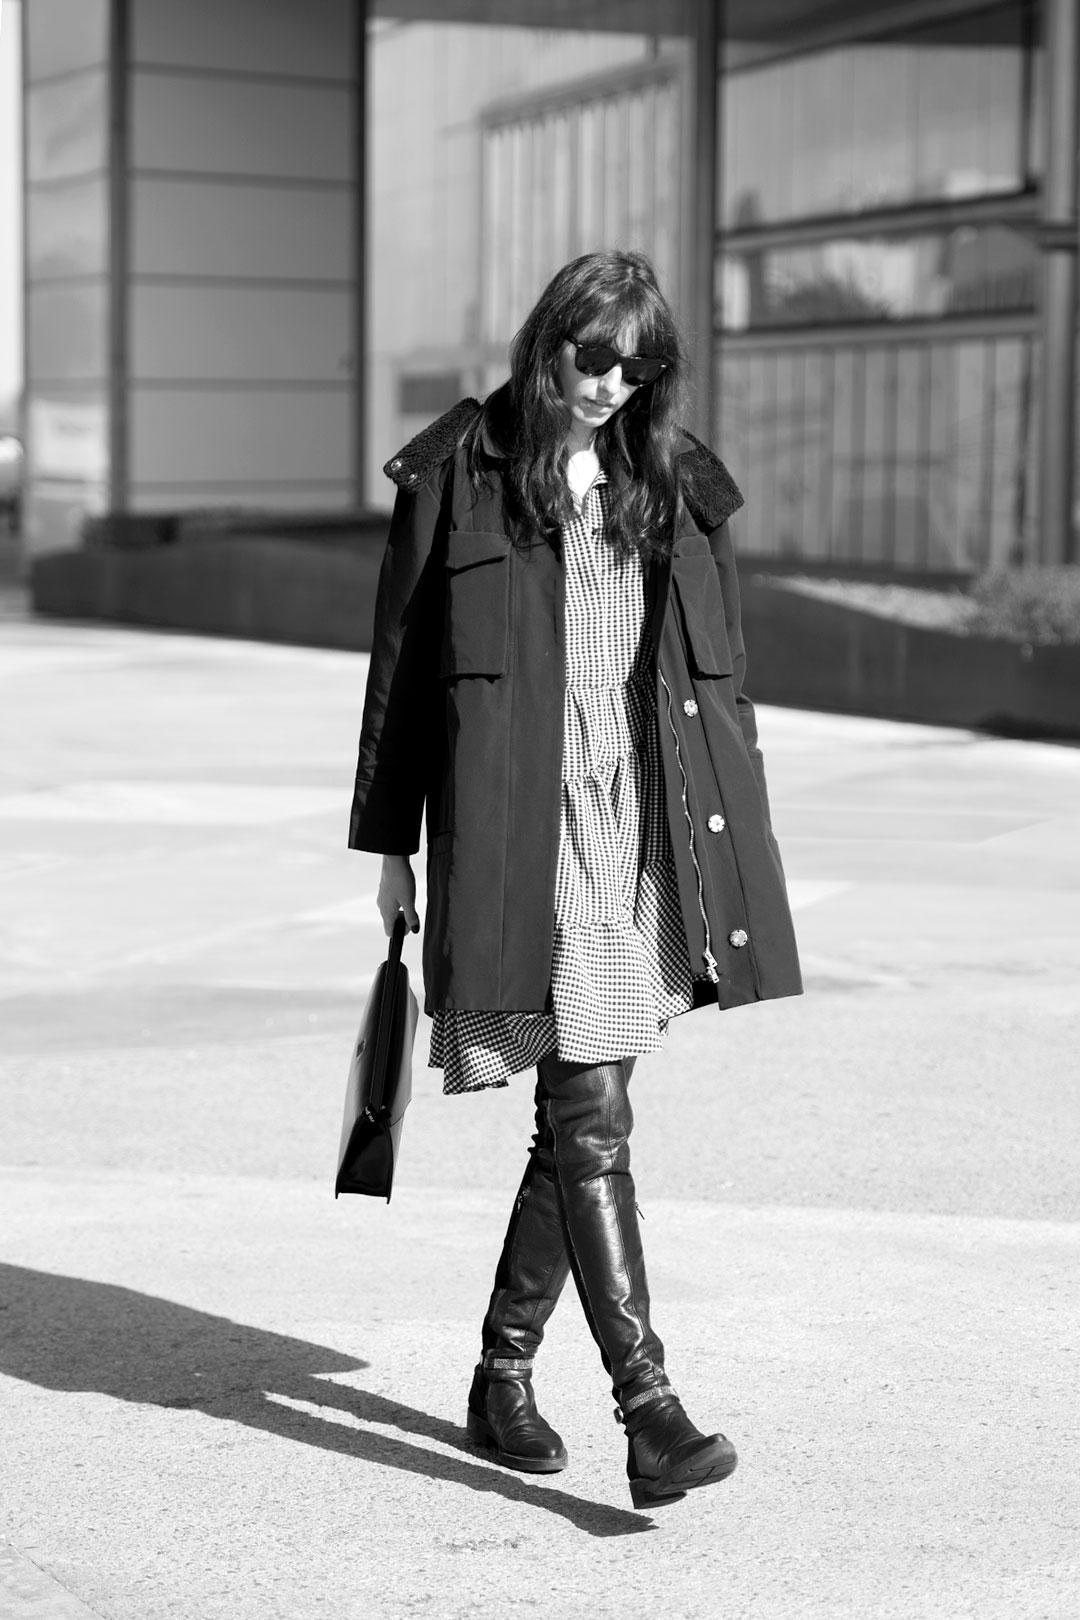 mbfwm-black-and-white-street-style-mitmeblog-bn-web-01